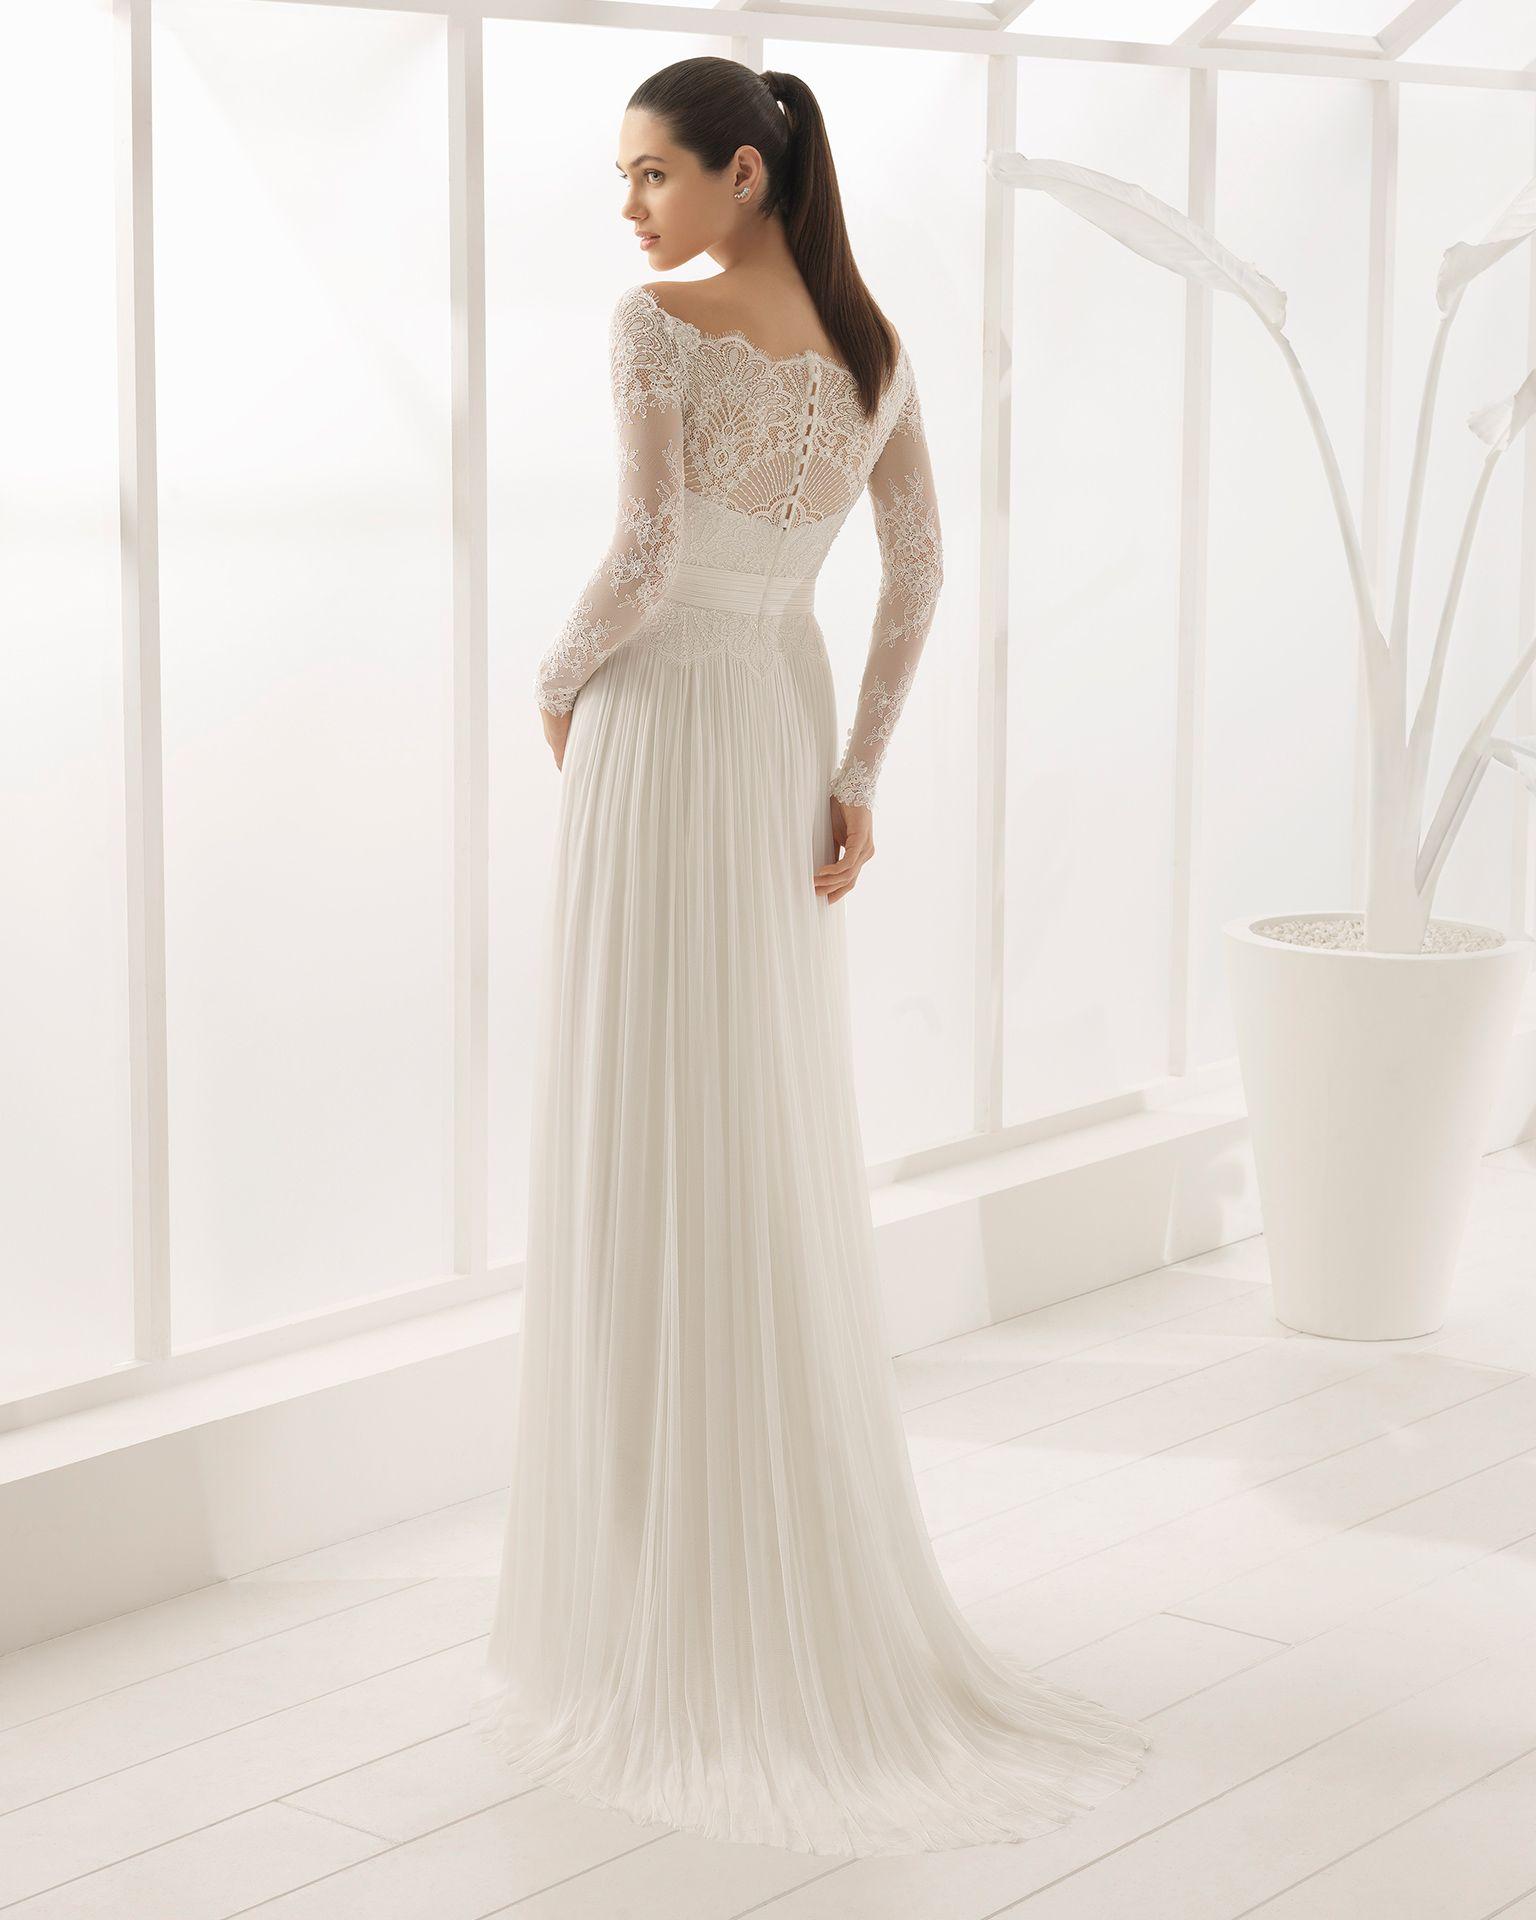 LINA - Hochzeit 2018. Kollektion Rosa Clará Soft | Rosa clará soft ...